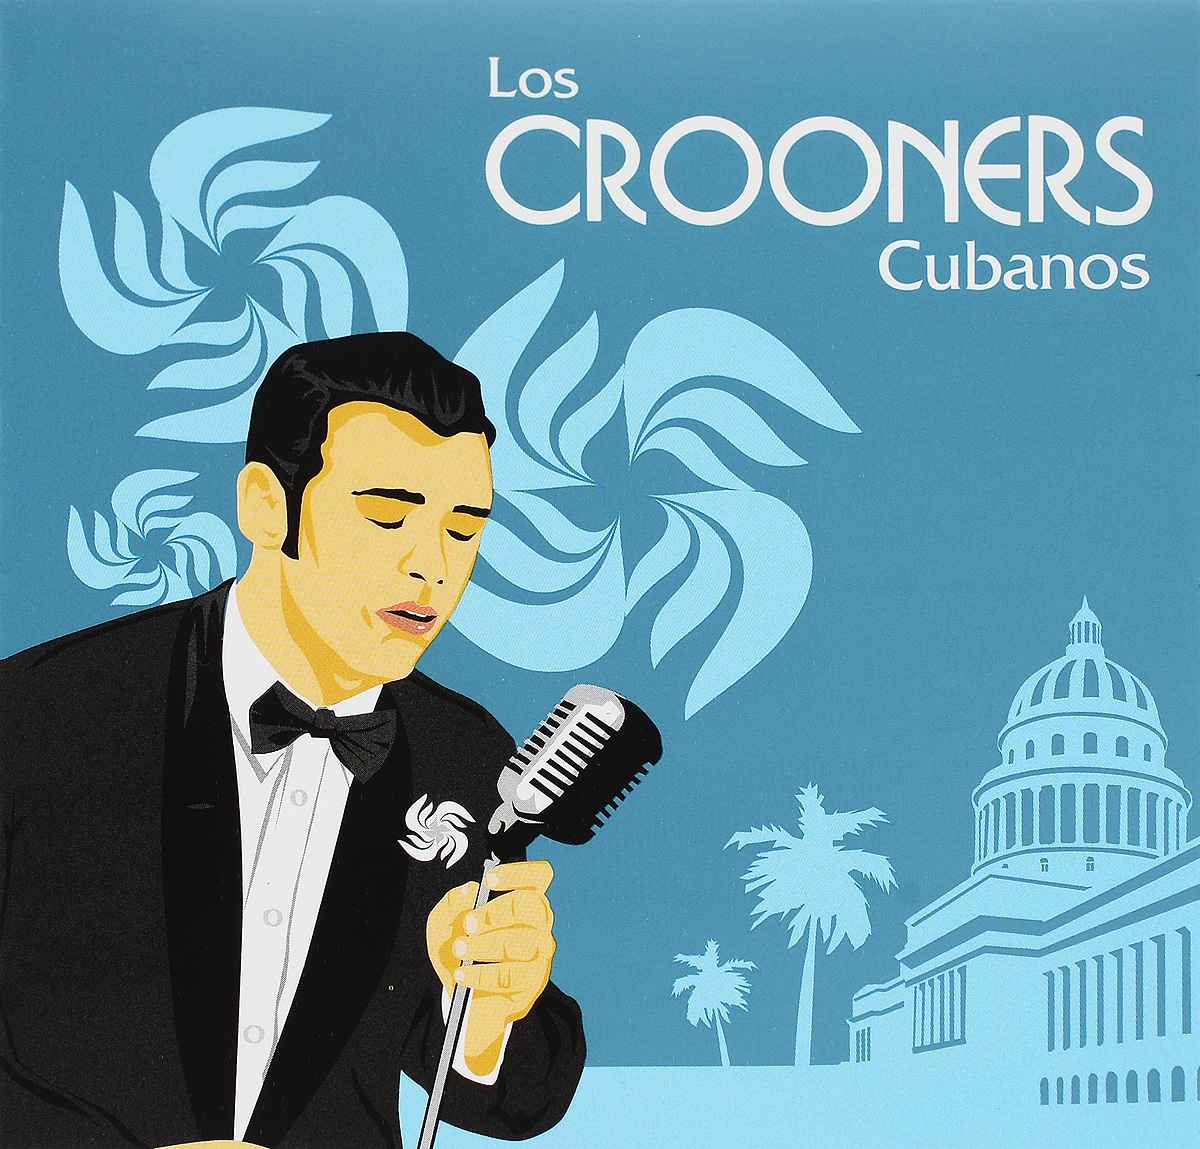 Los Crooners Cubanos каталог empire